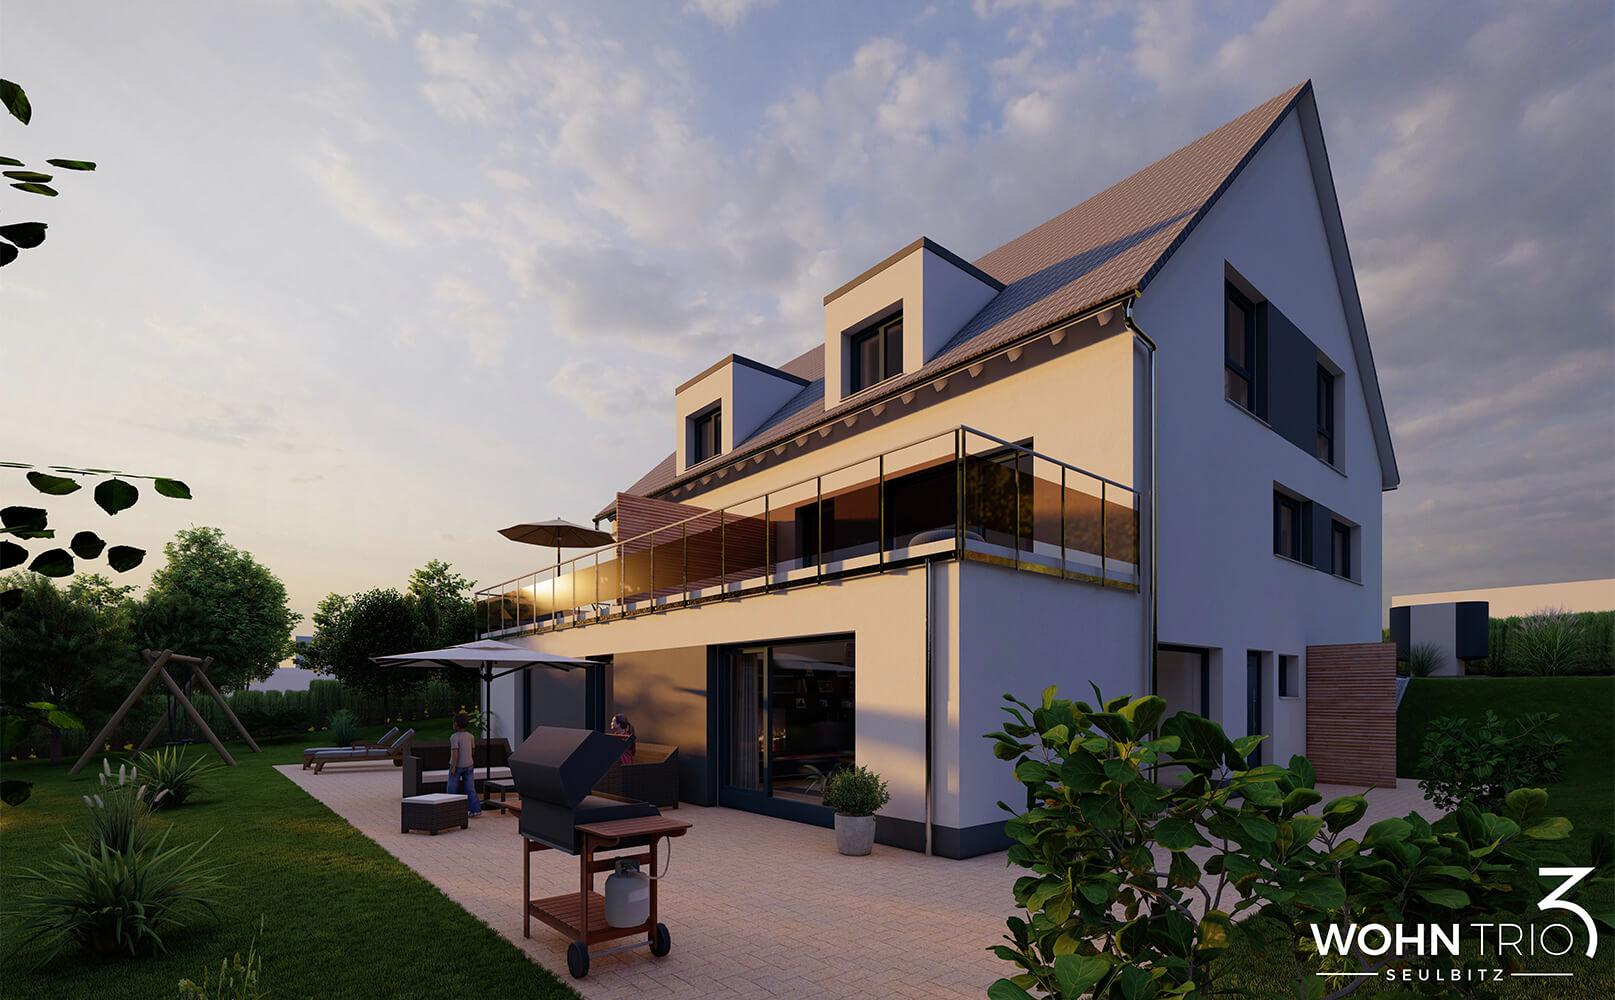 JT Thamer - Neubauprojekt Wohntrio Seulbitz